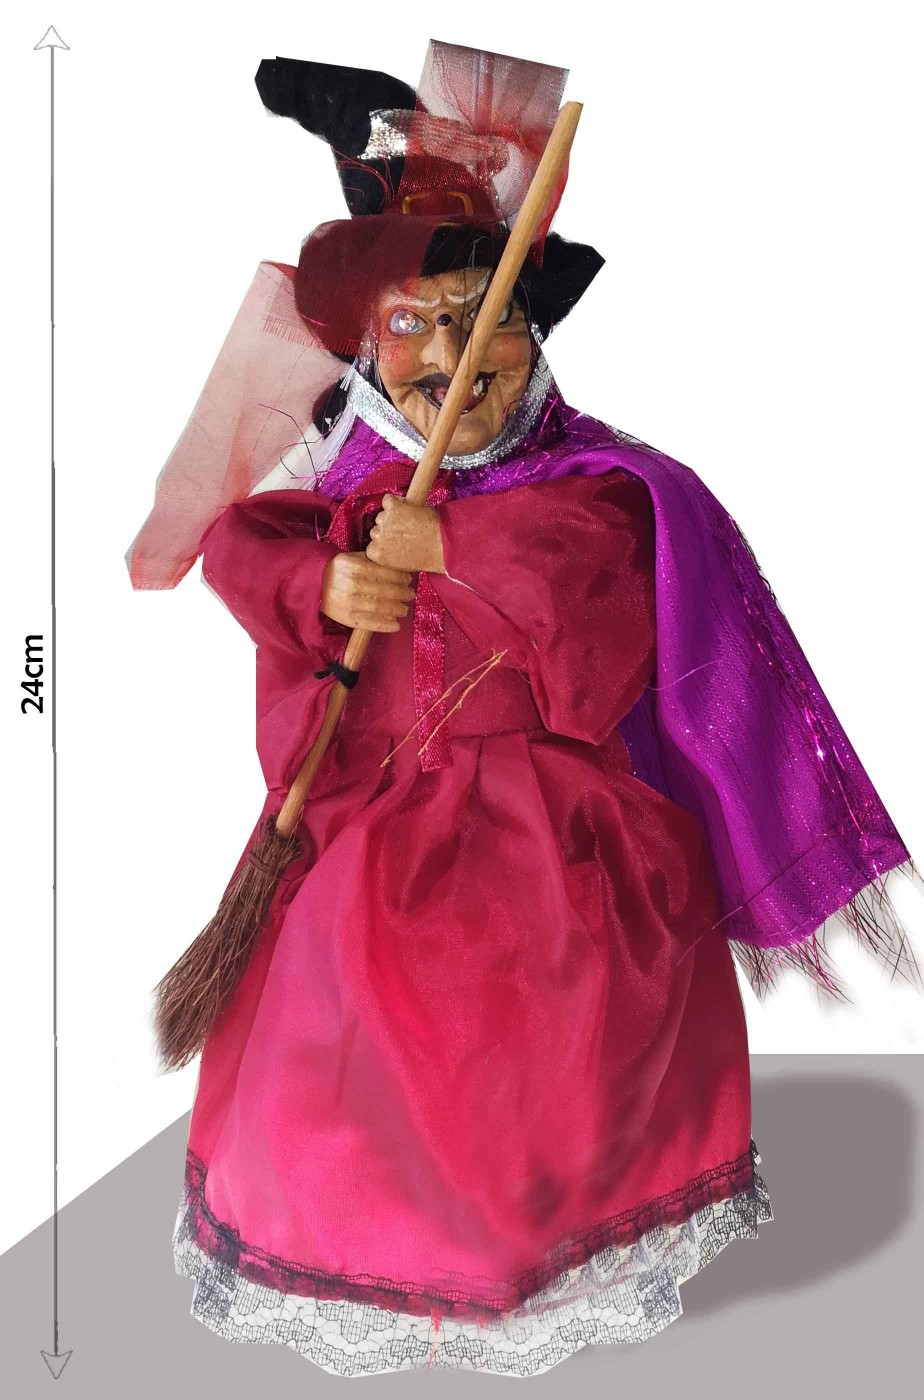 Befana decorativa Strega rossa porpora con scopa 23cm rossa